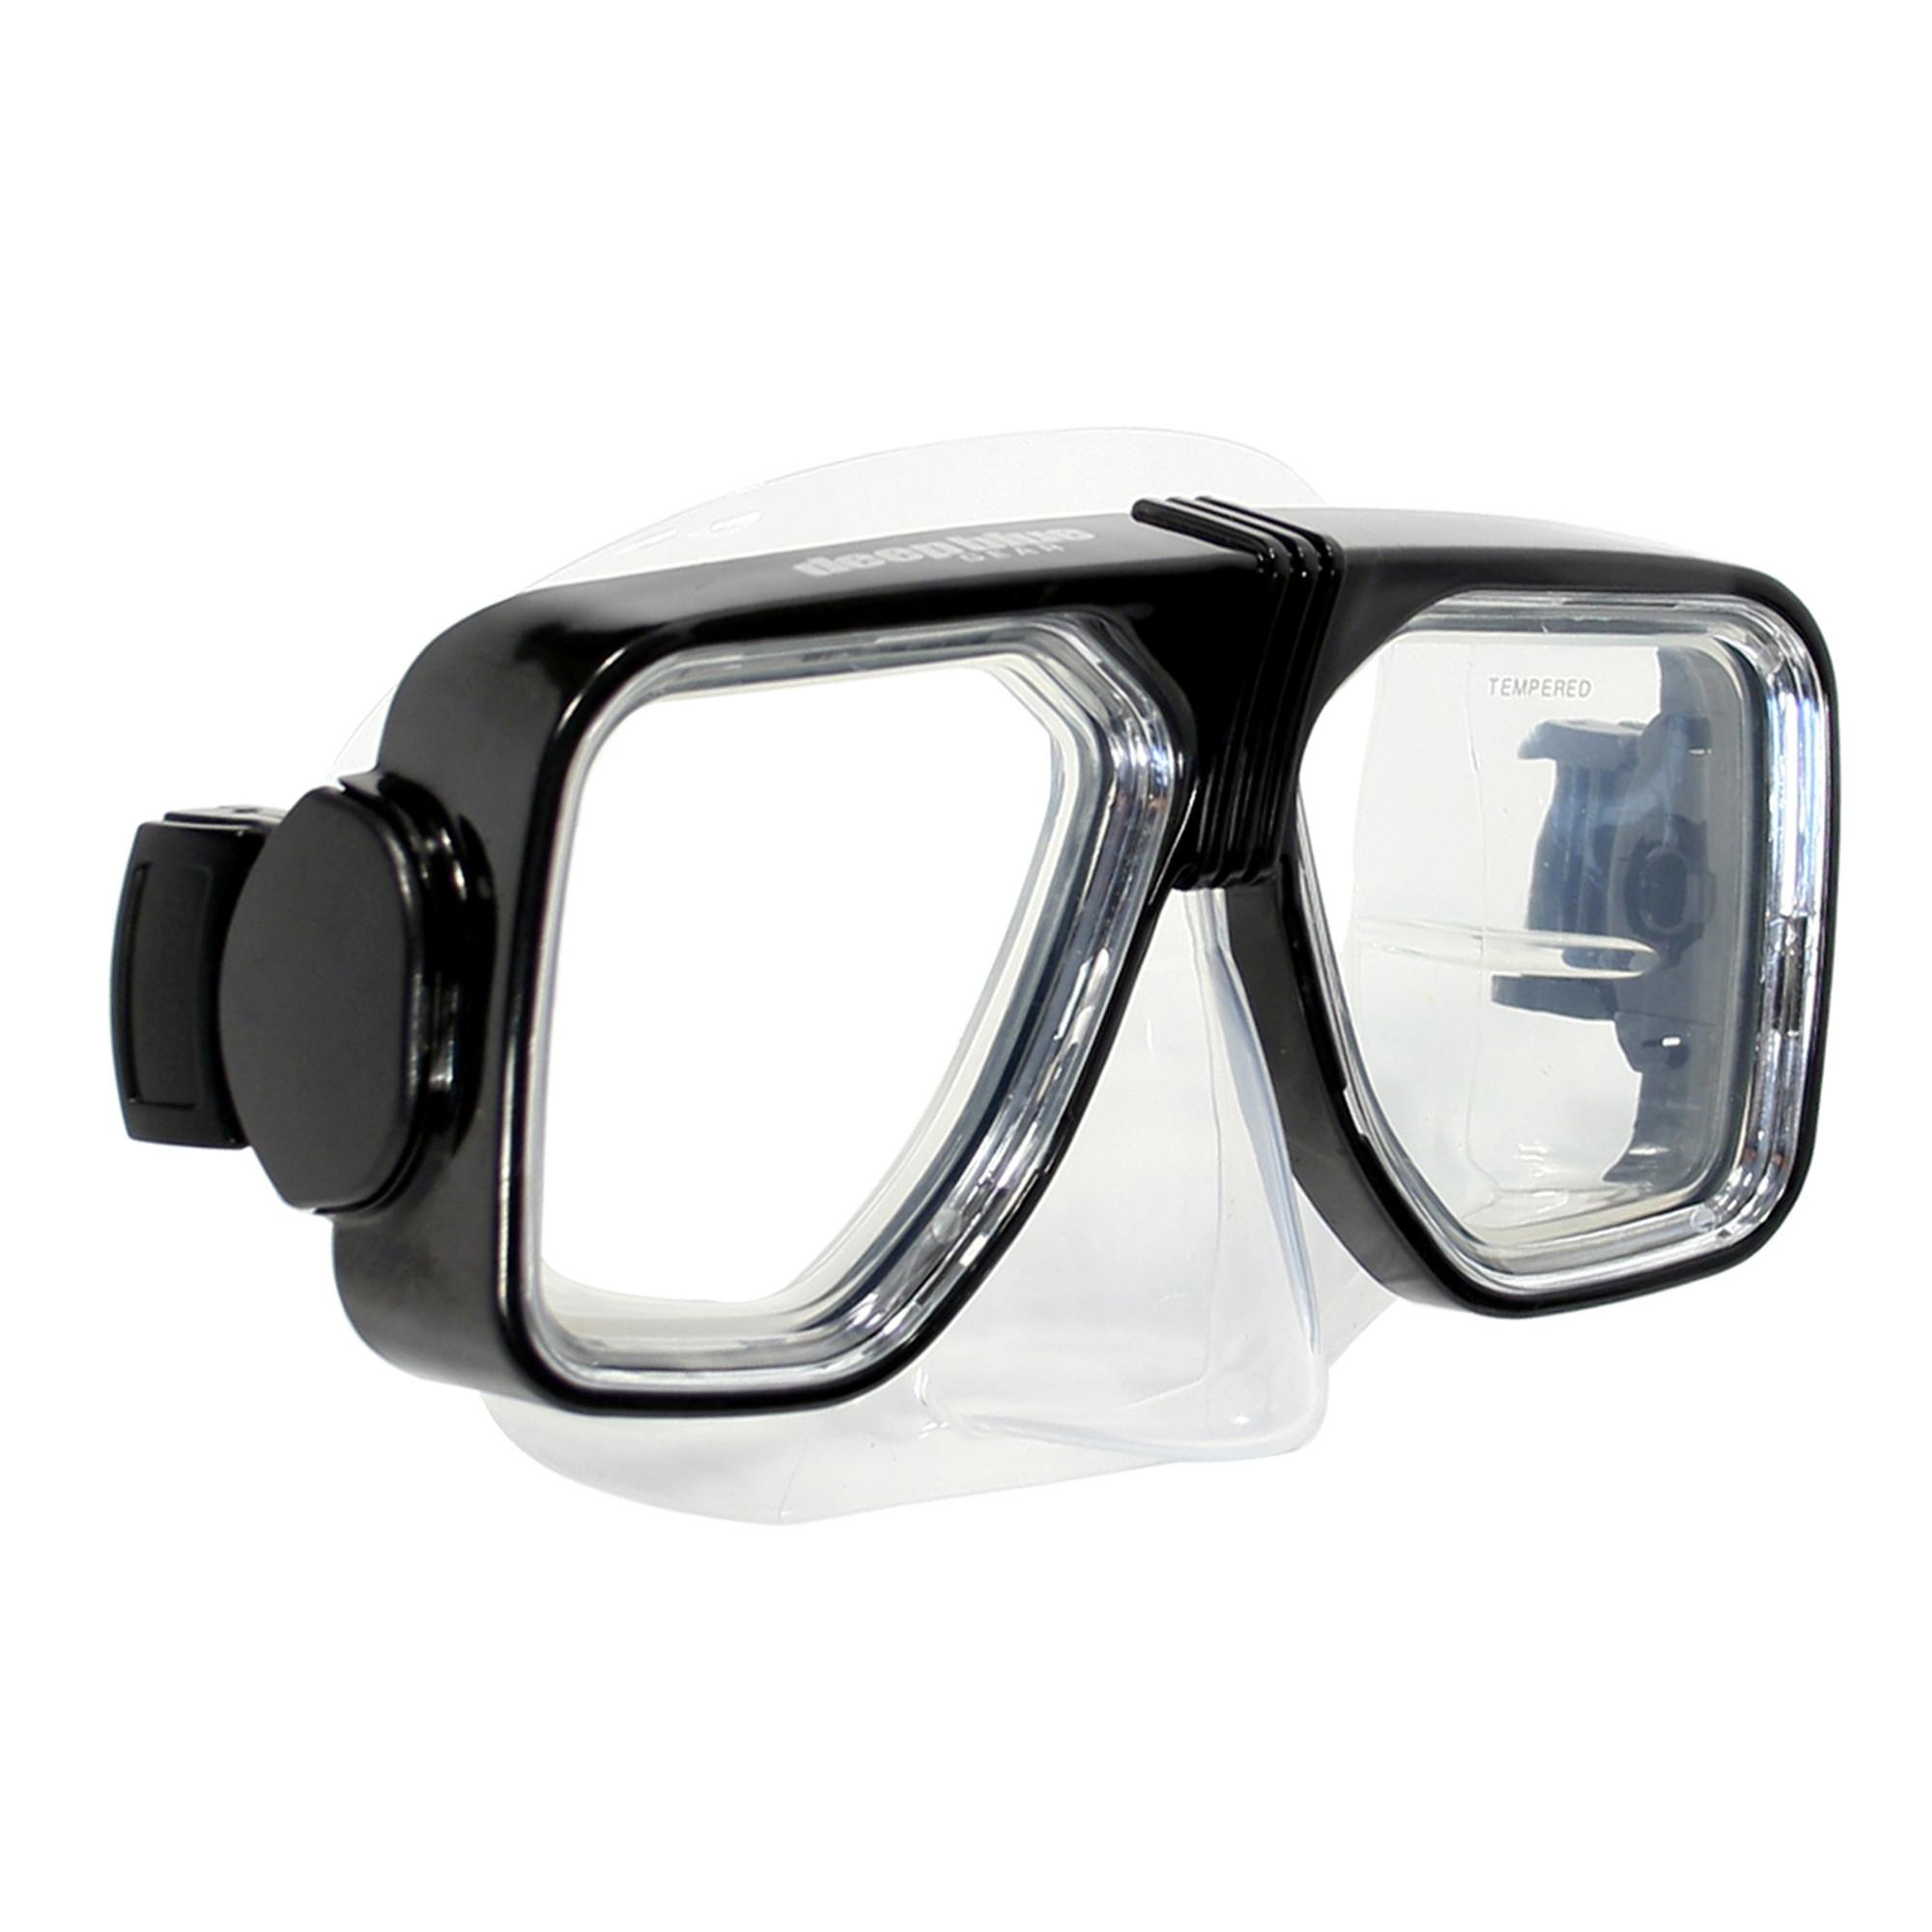 Travel Ready - Adult Snorkeling Set